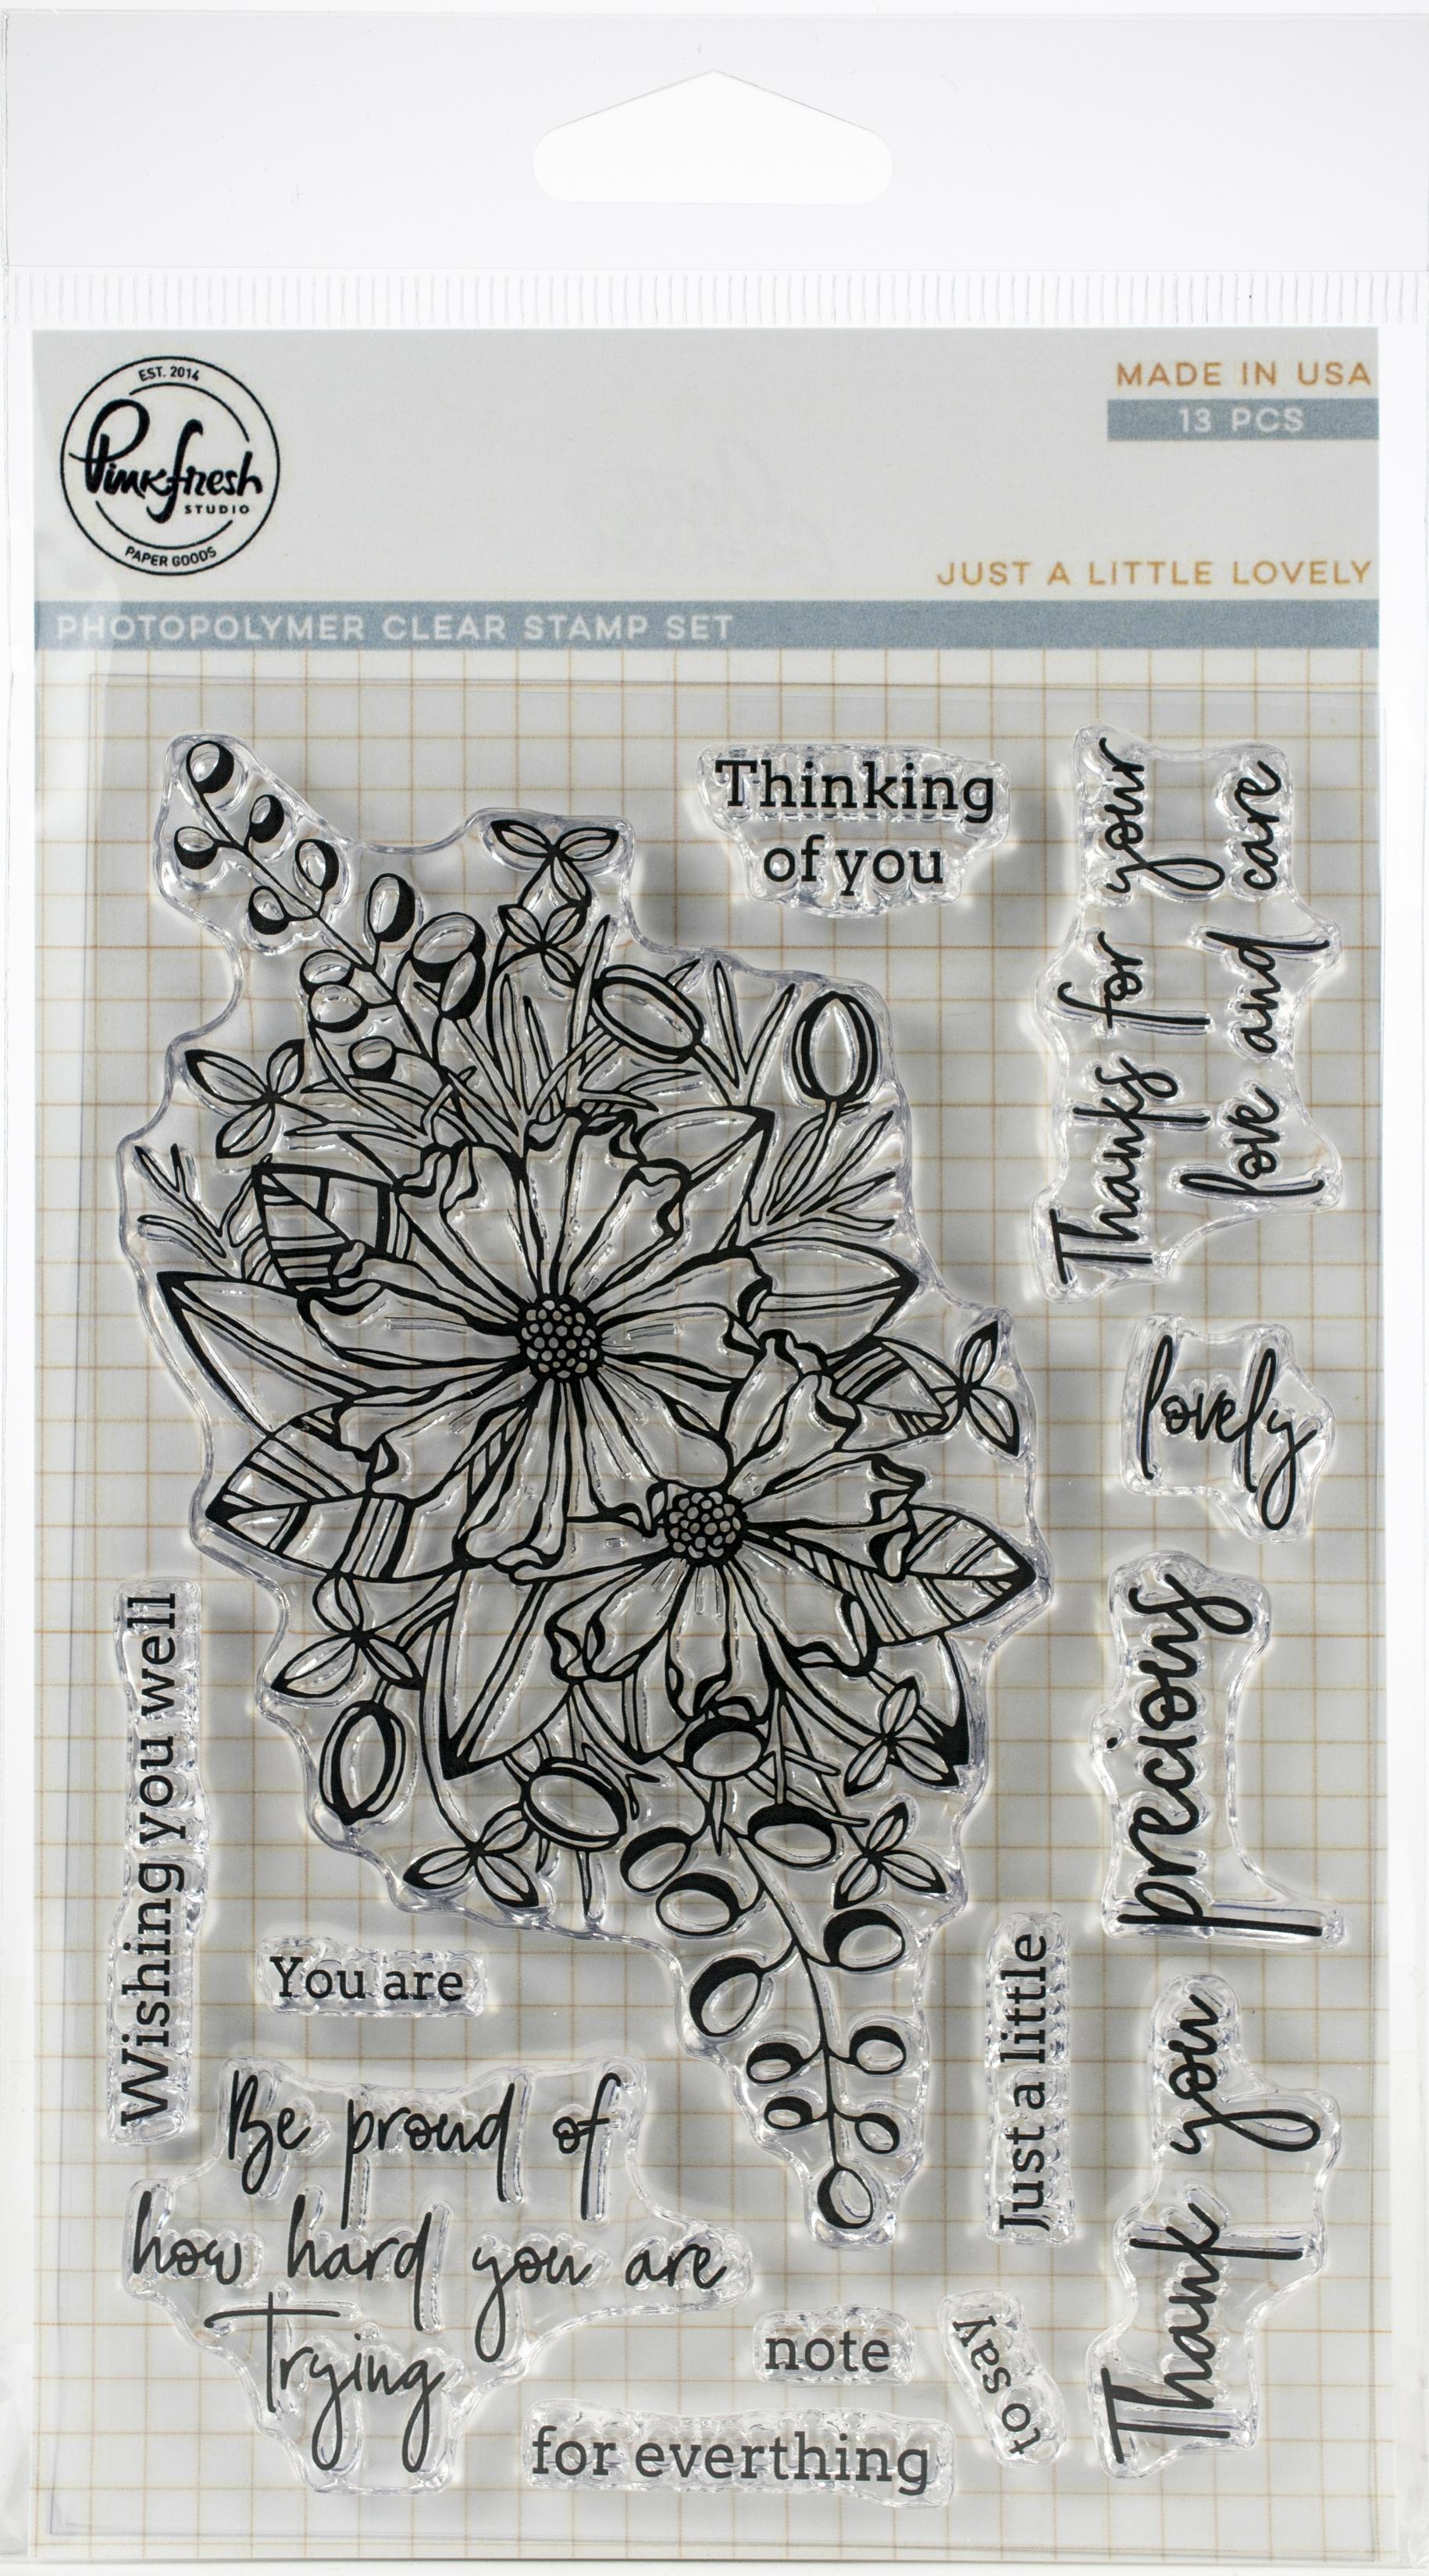 PinkFresh - Just A Little Lovely - 4x6 Stamp Set